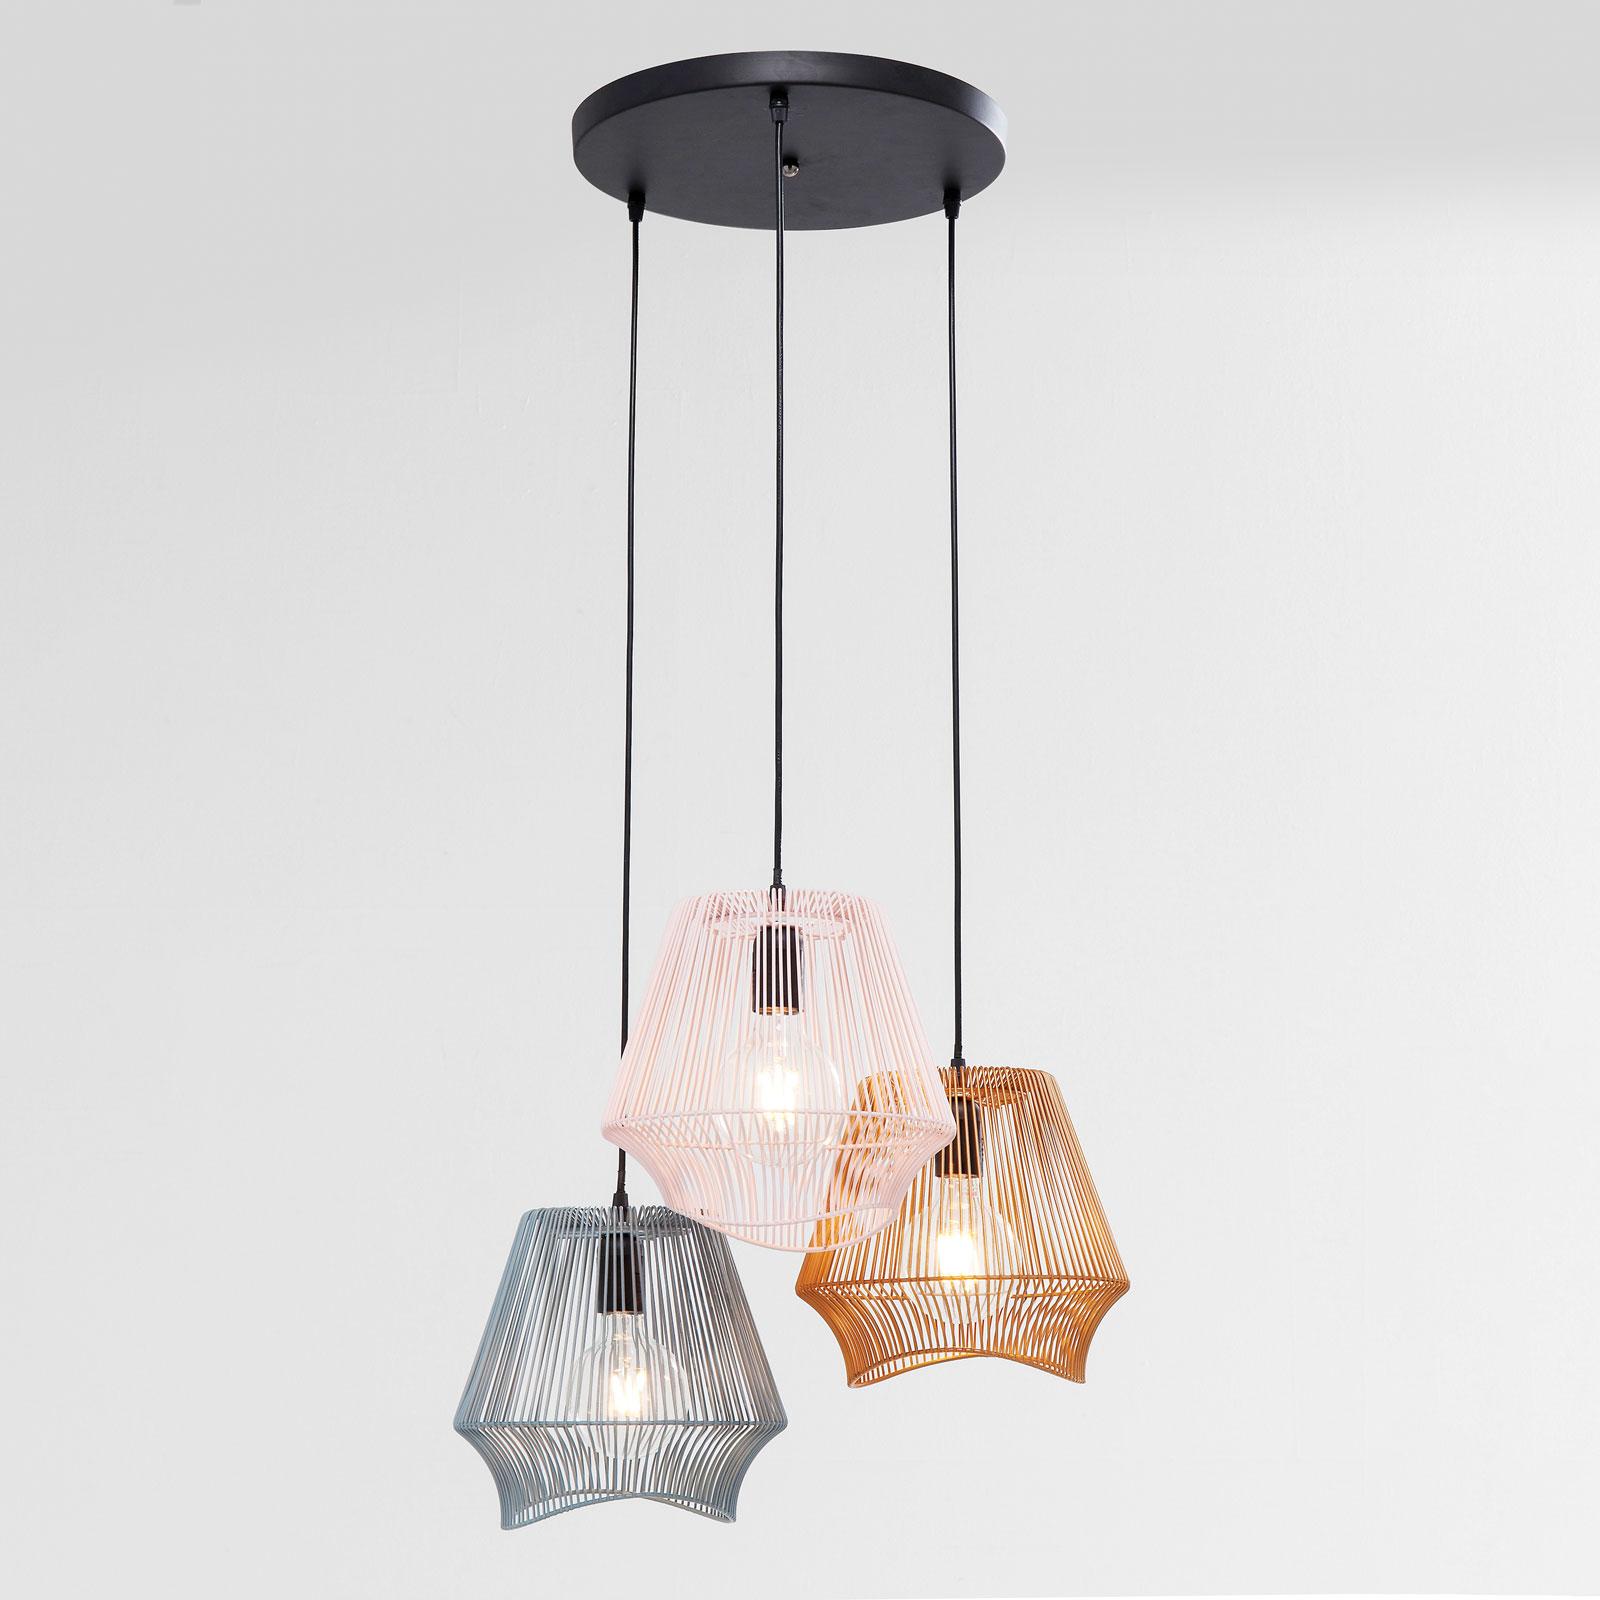 KARE Ischia Spiral lampa wisząca, Ø 50 cm